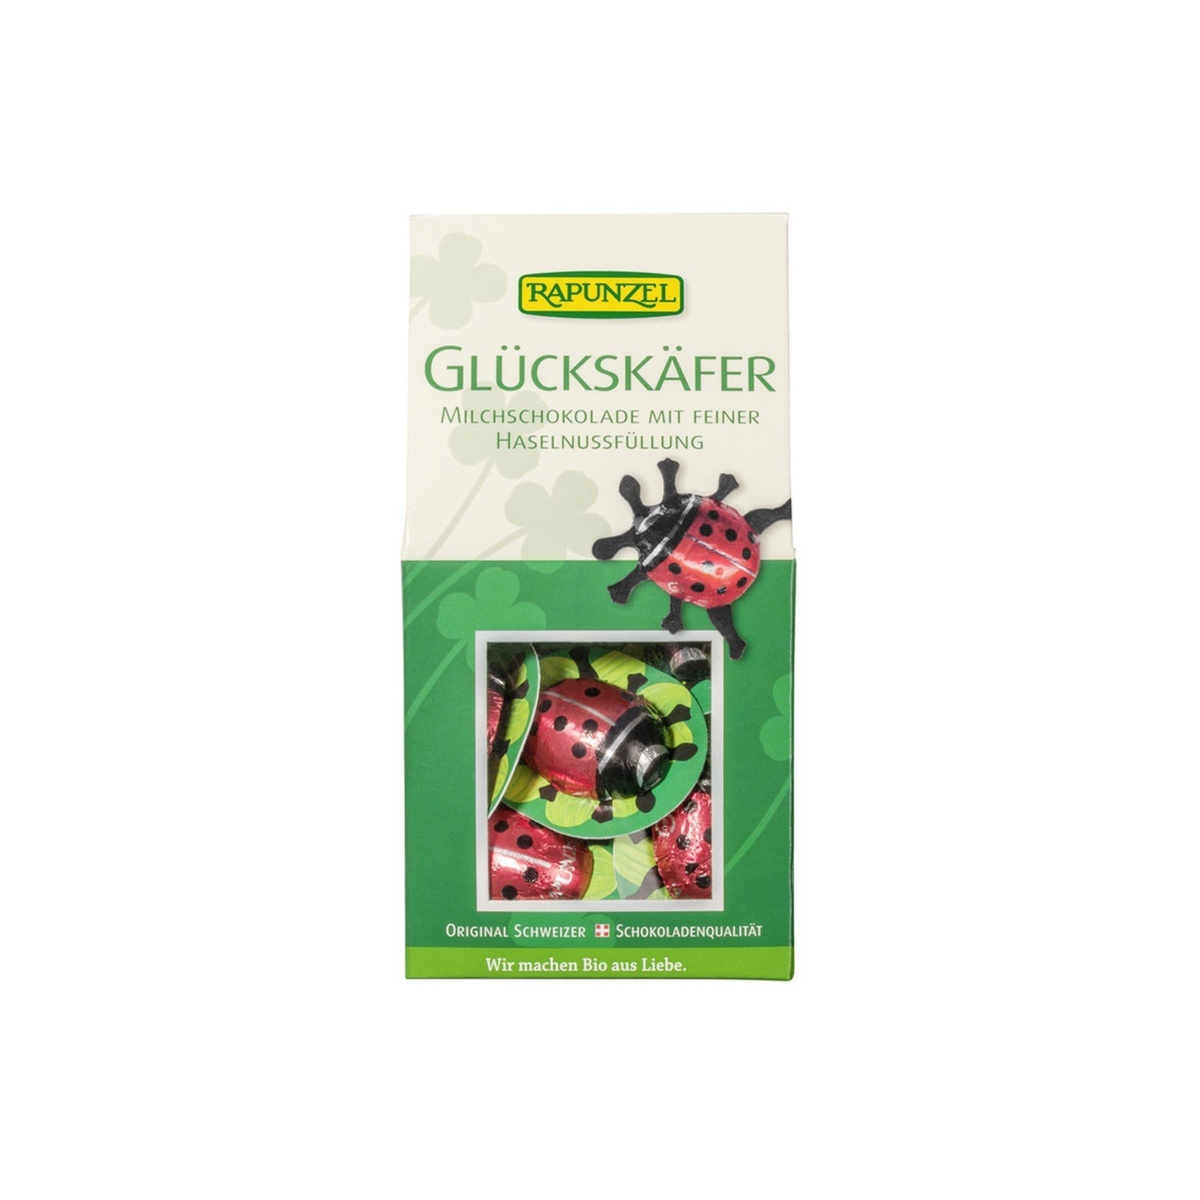 Glückskäfer, HIH Pack 100 g - Rapunzel